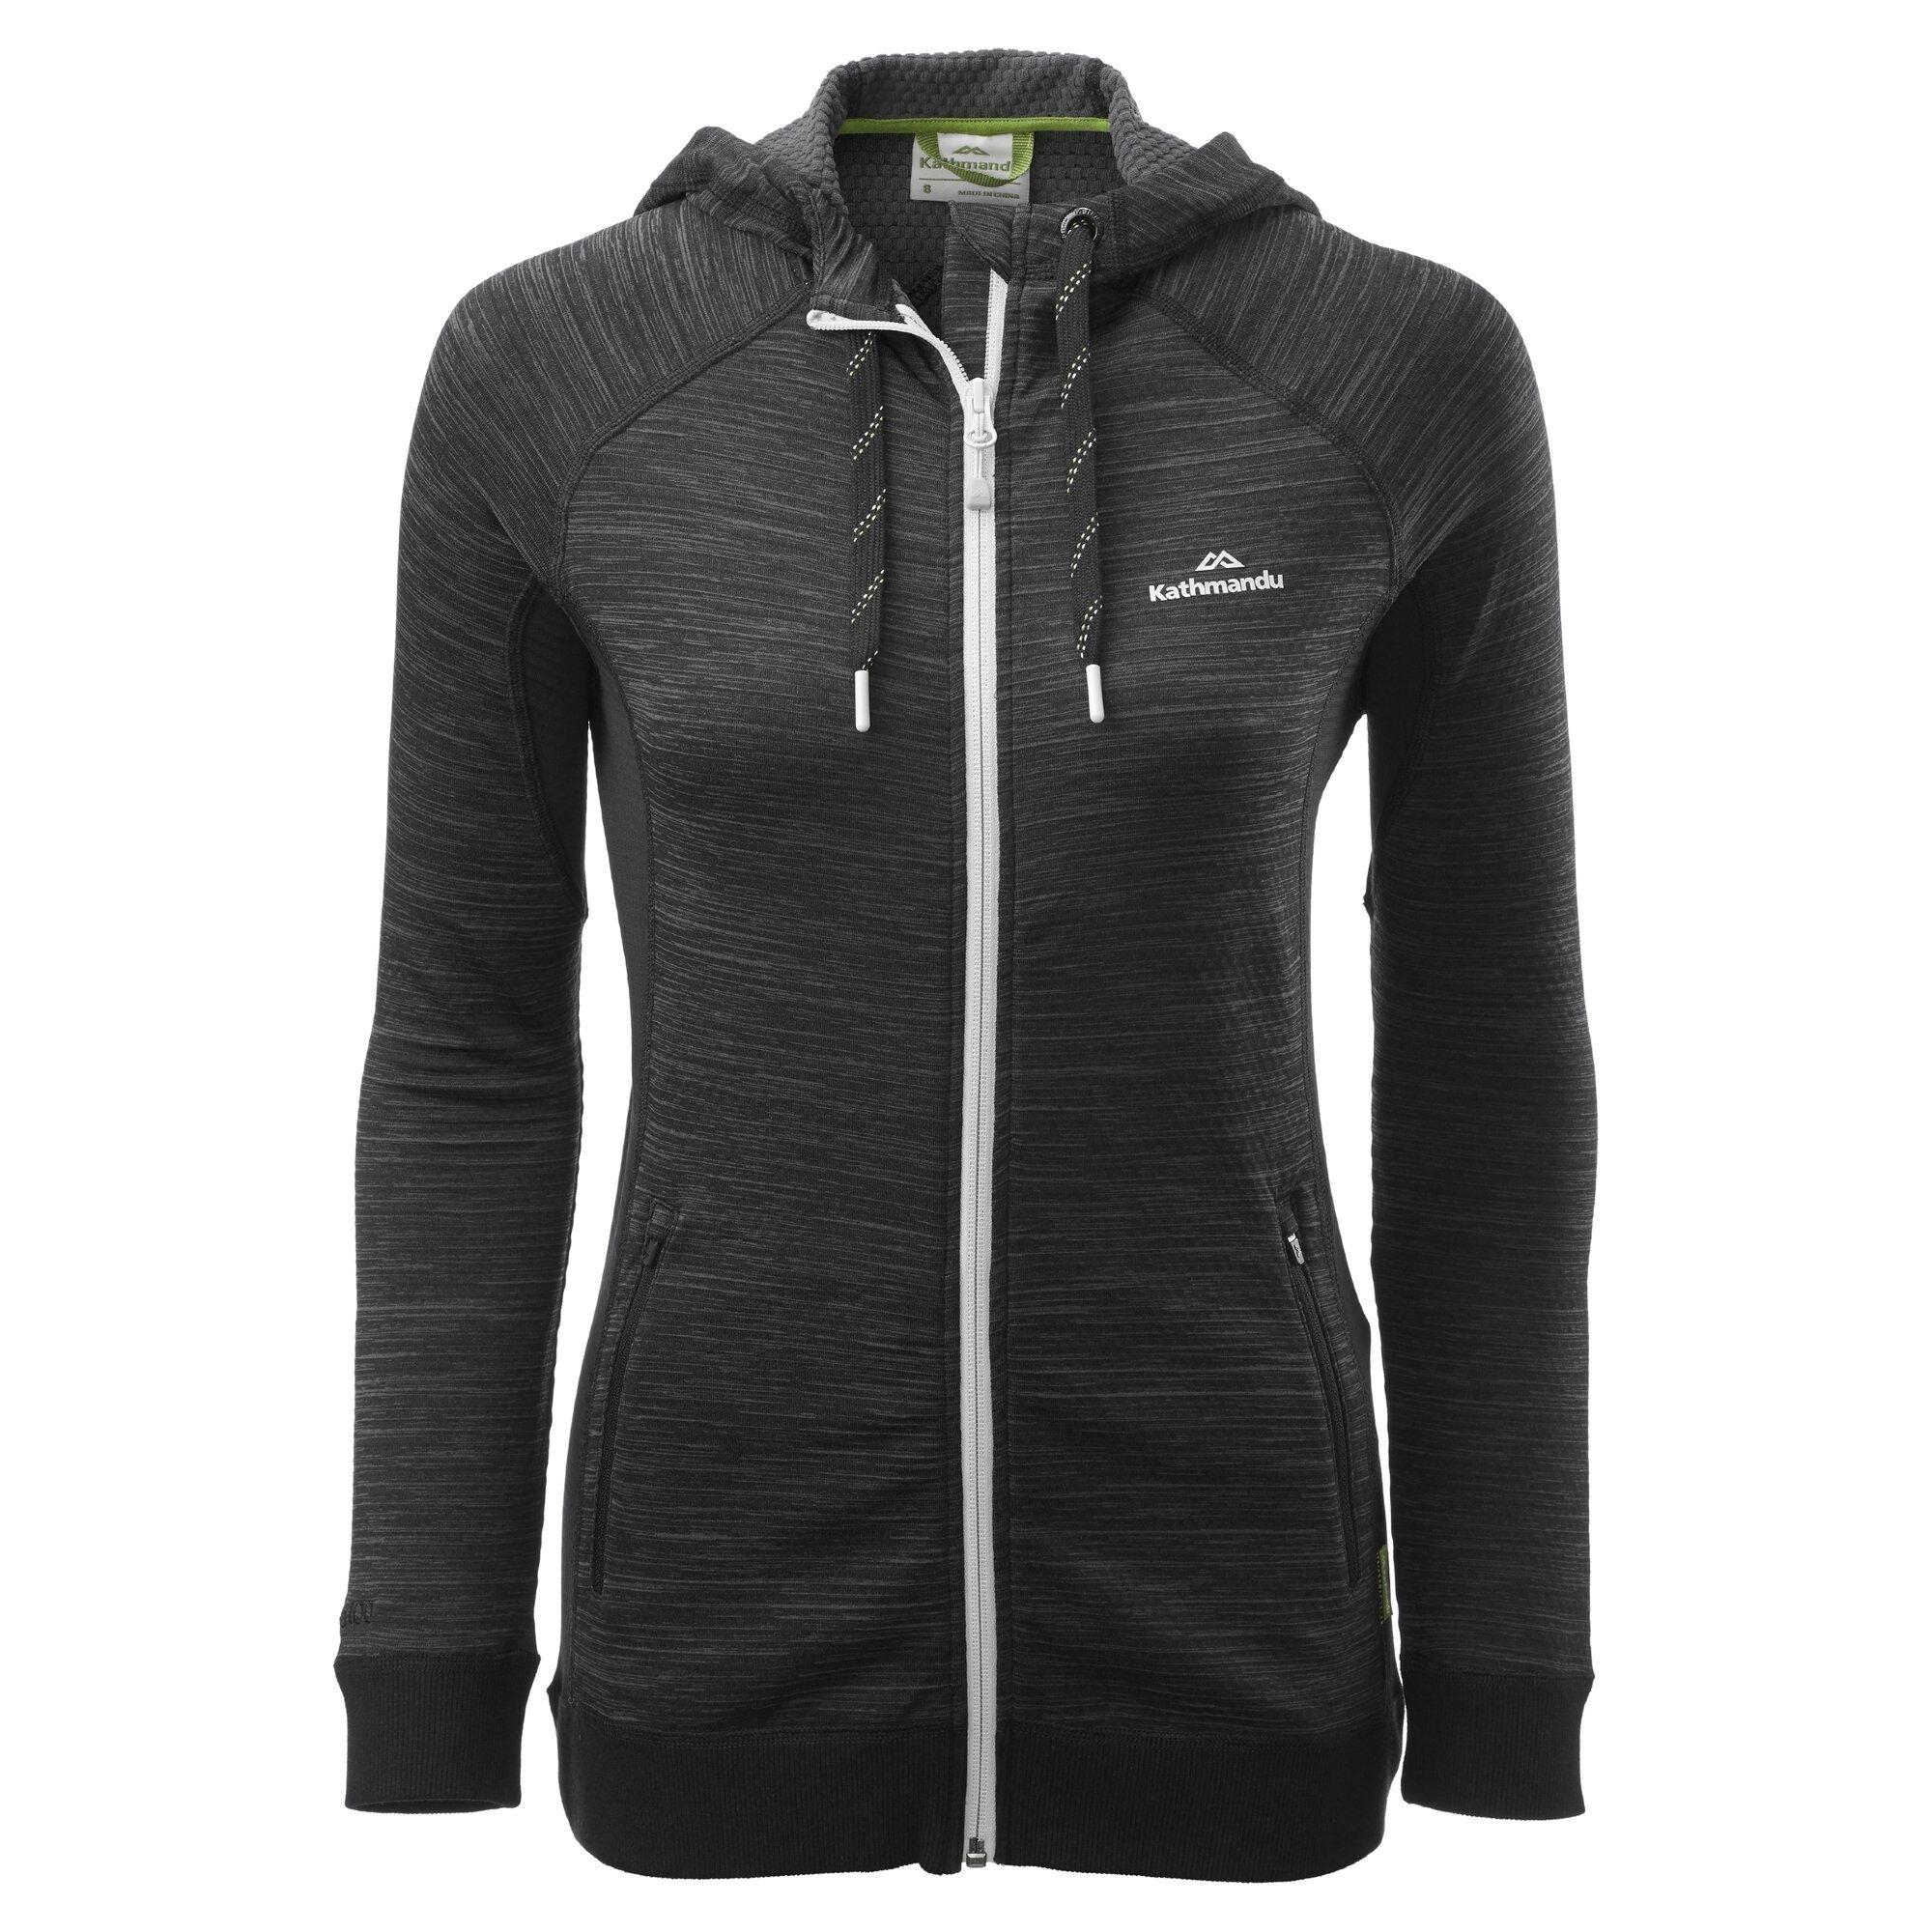 Kathmandu Acota Women's Hooded Fleece Jacket  - Granite Marle/Black - Size: US 6